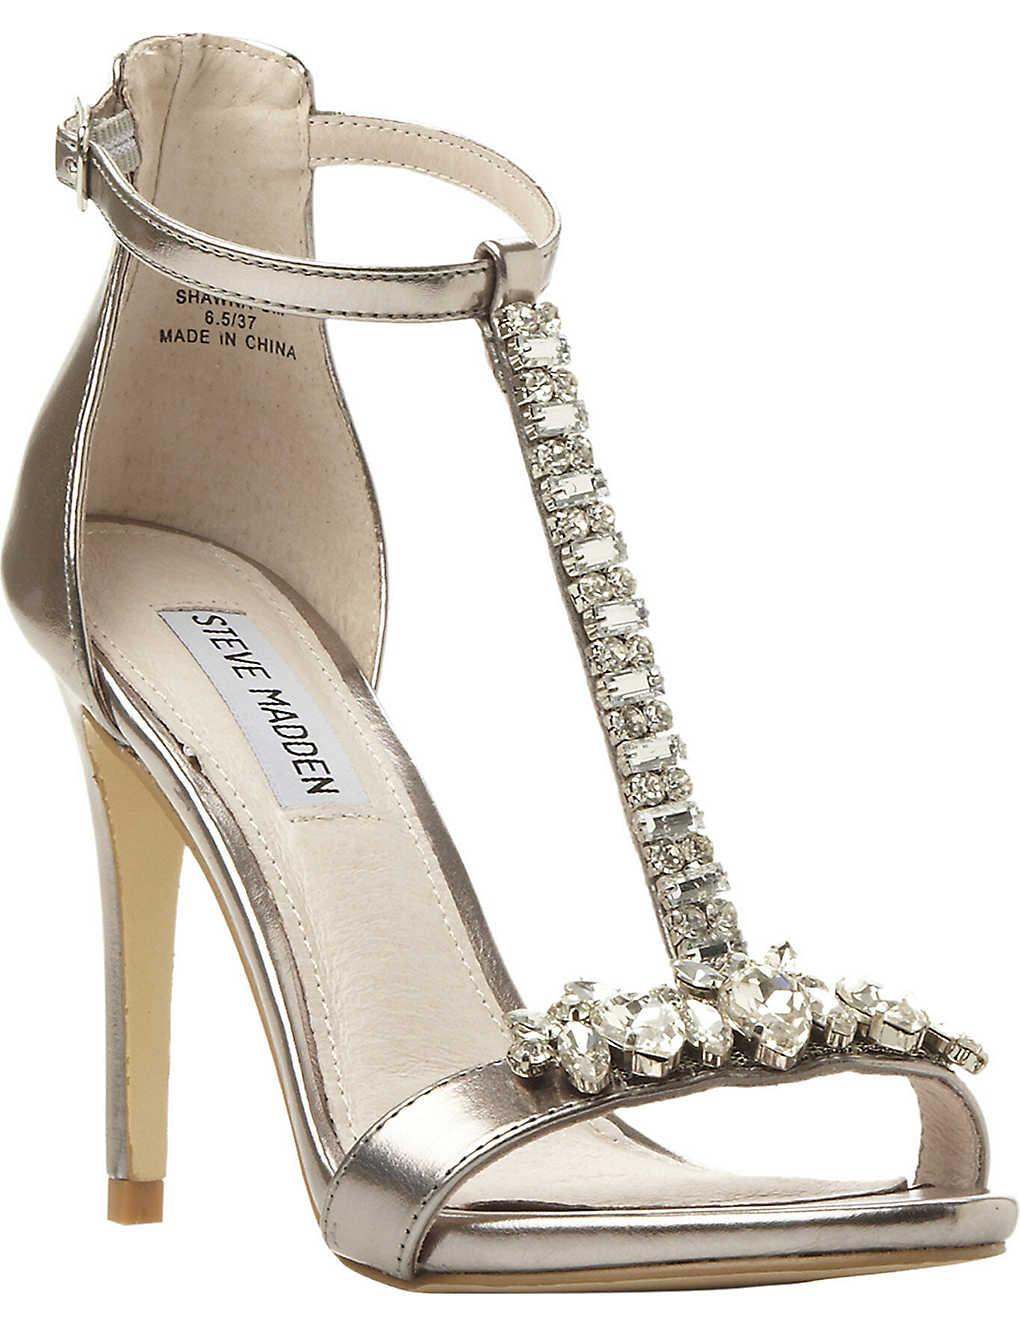 dbc3e9d0296 STEVE MADDEN - Shawna embellished t-bar sandals